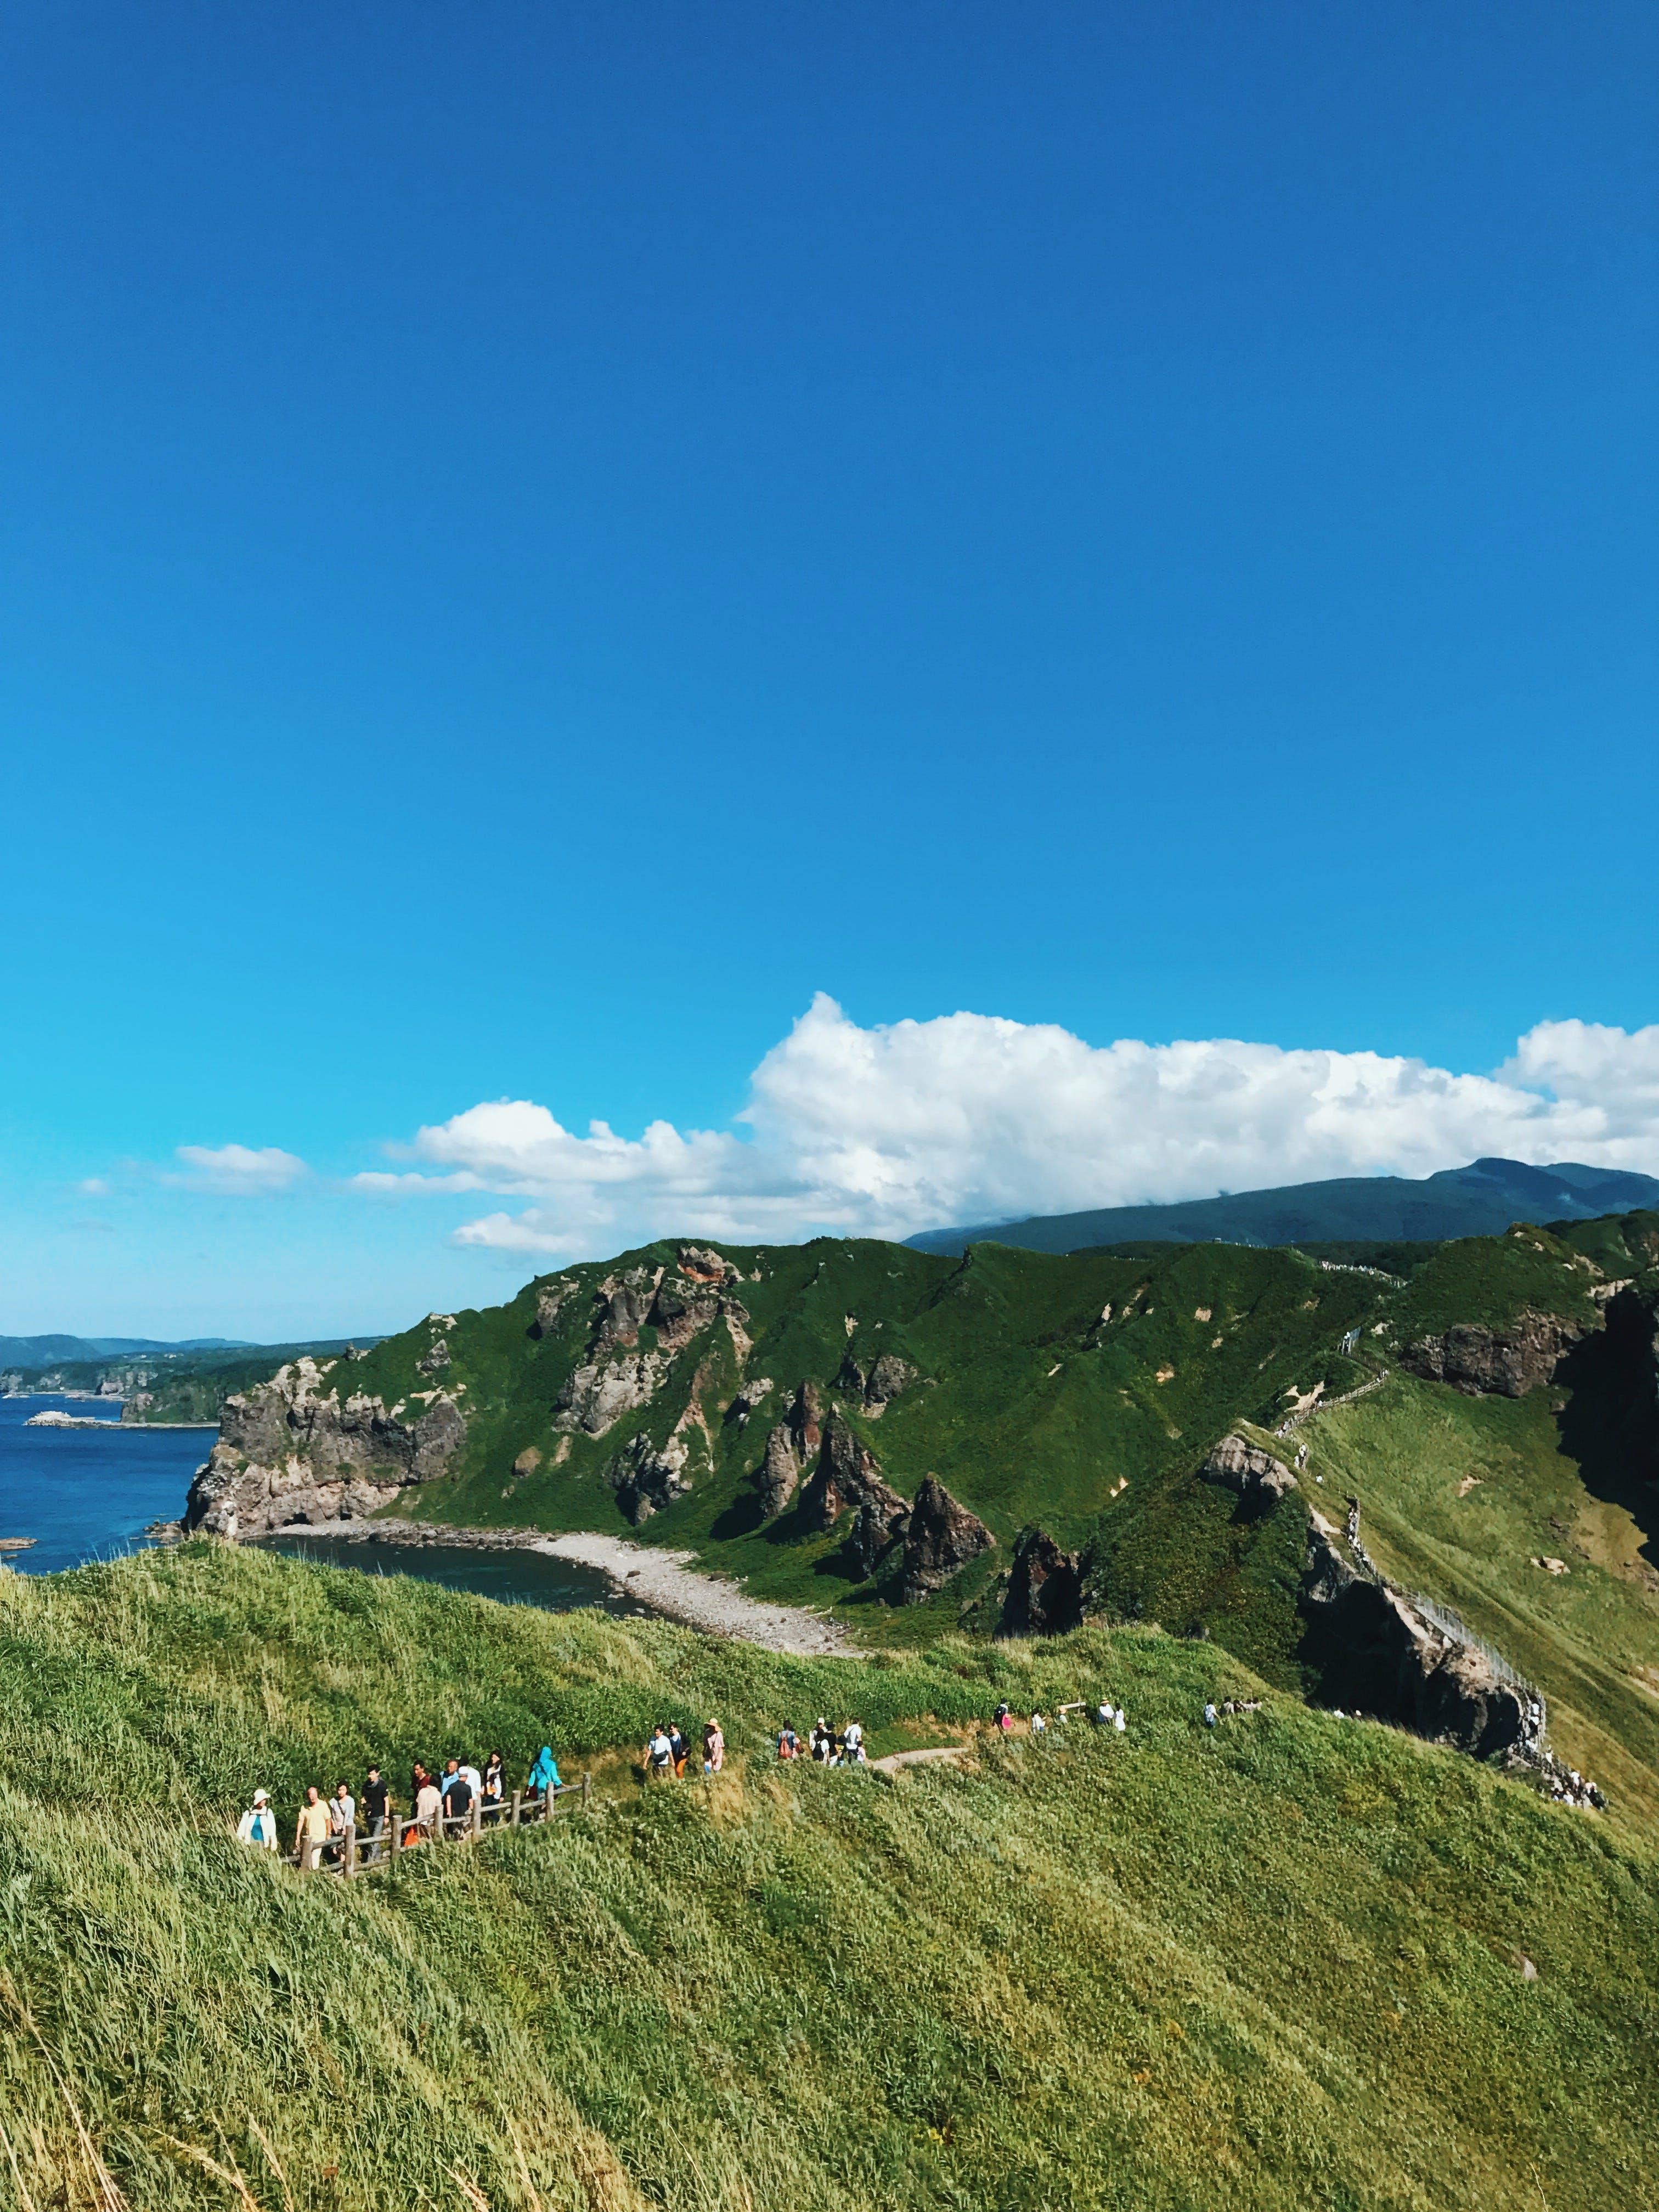 Free stock photo of #mountain, #nature